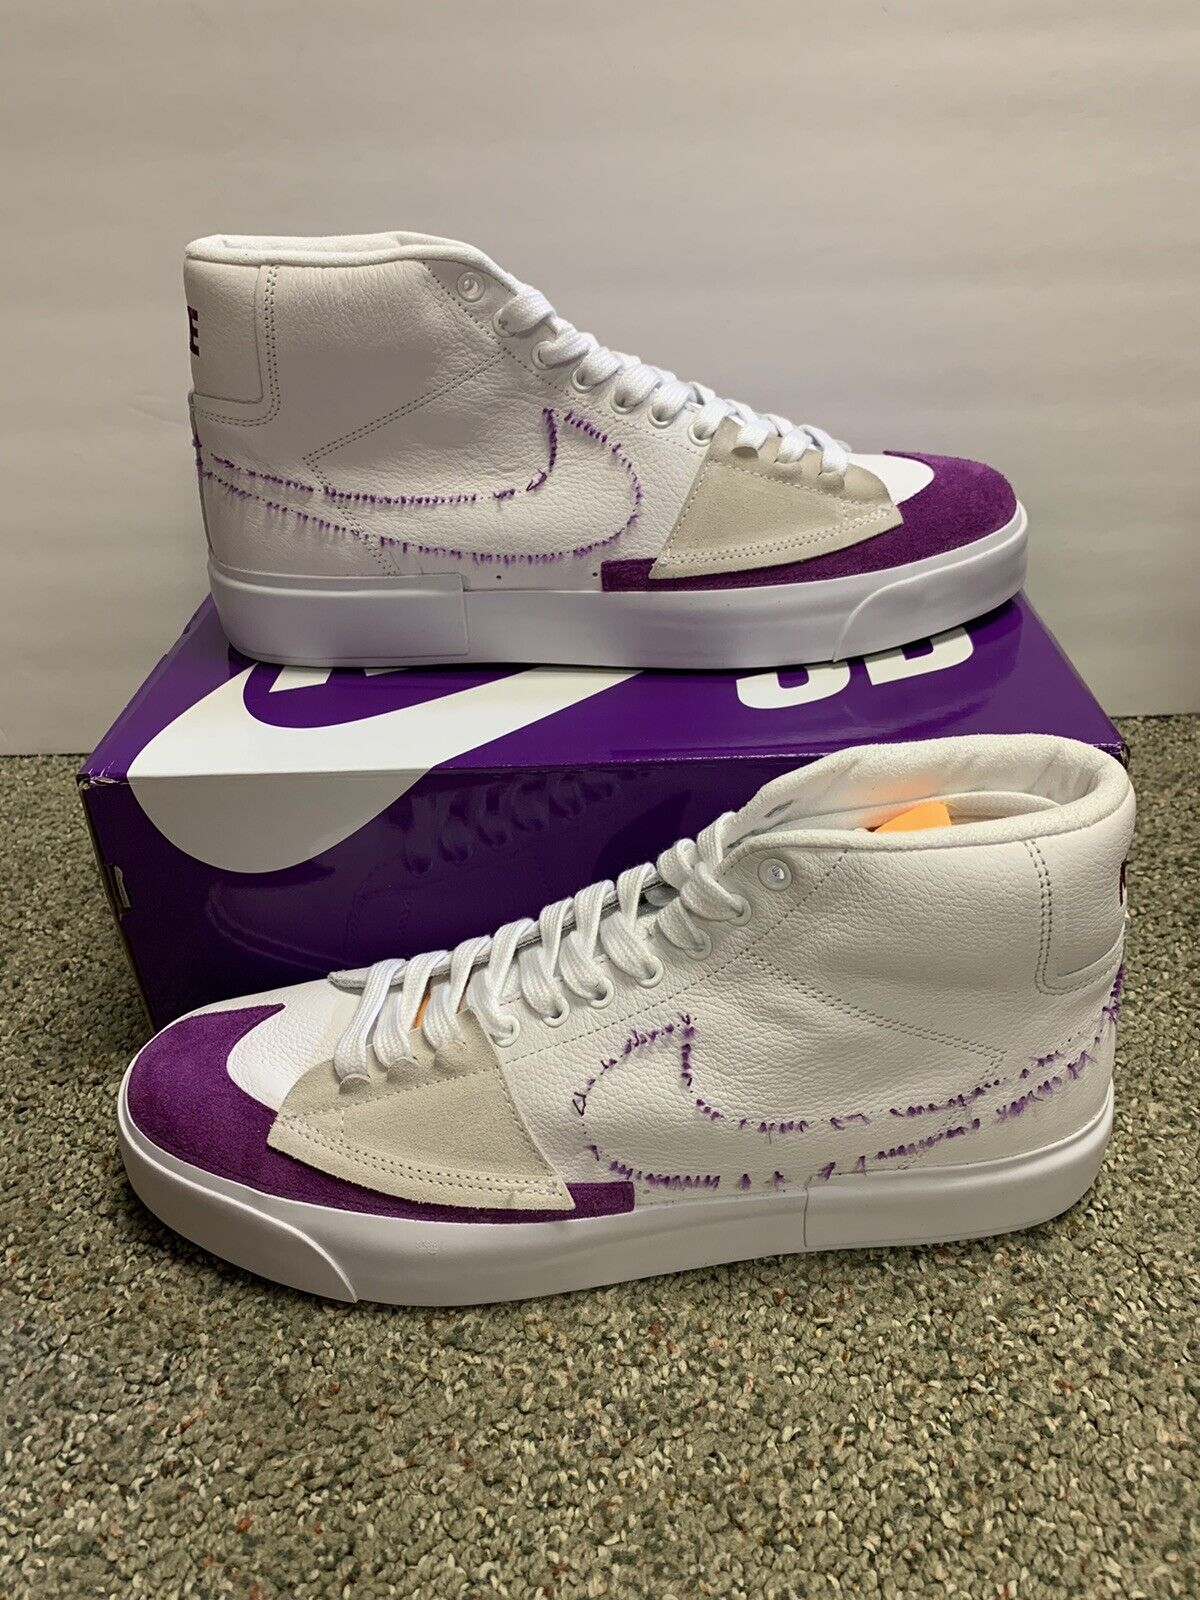 Size 12 - Nike SB Blazer Mid Edge Lakers for sale online | eBay